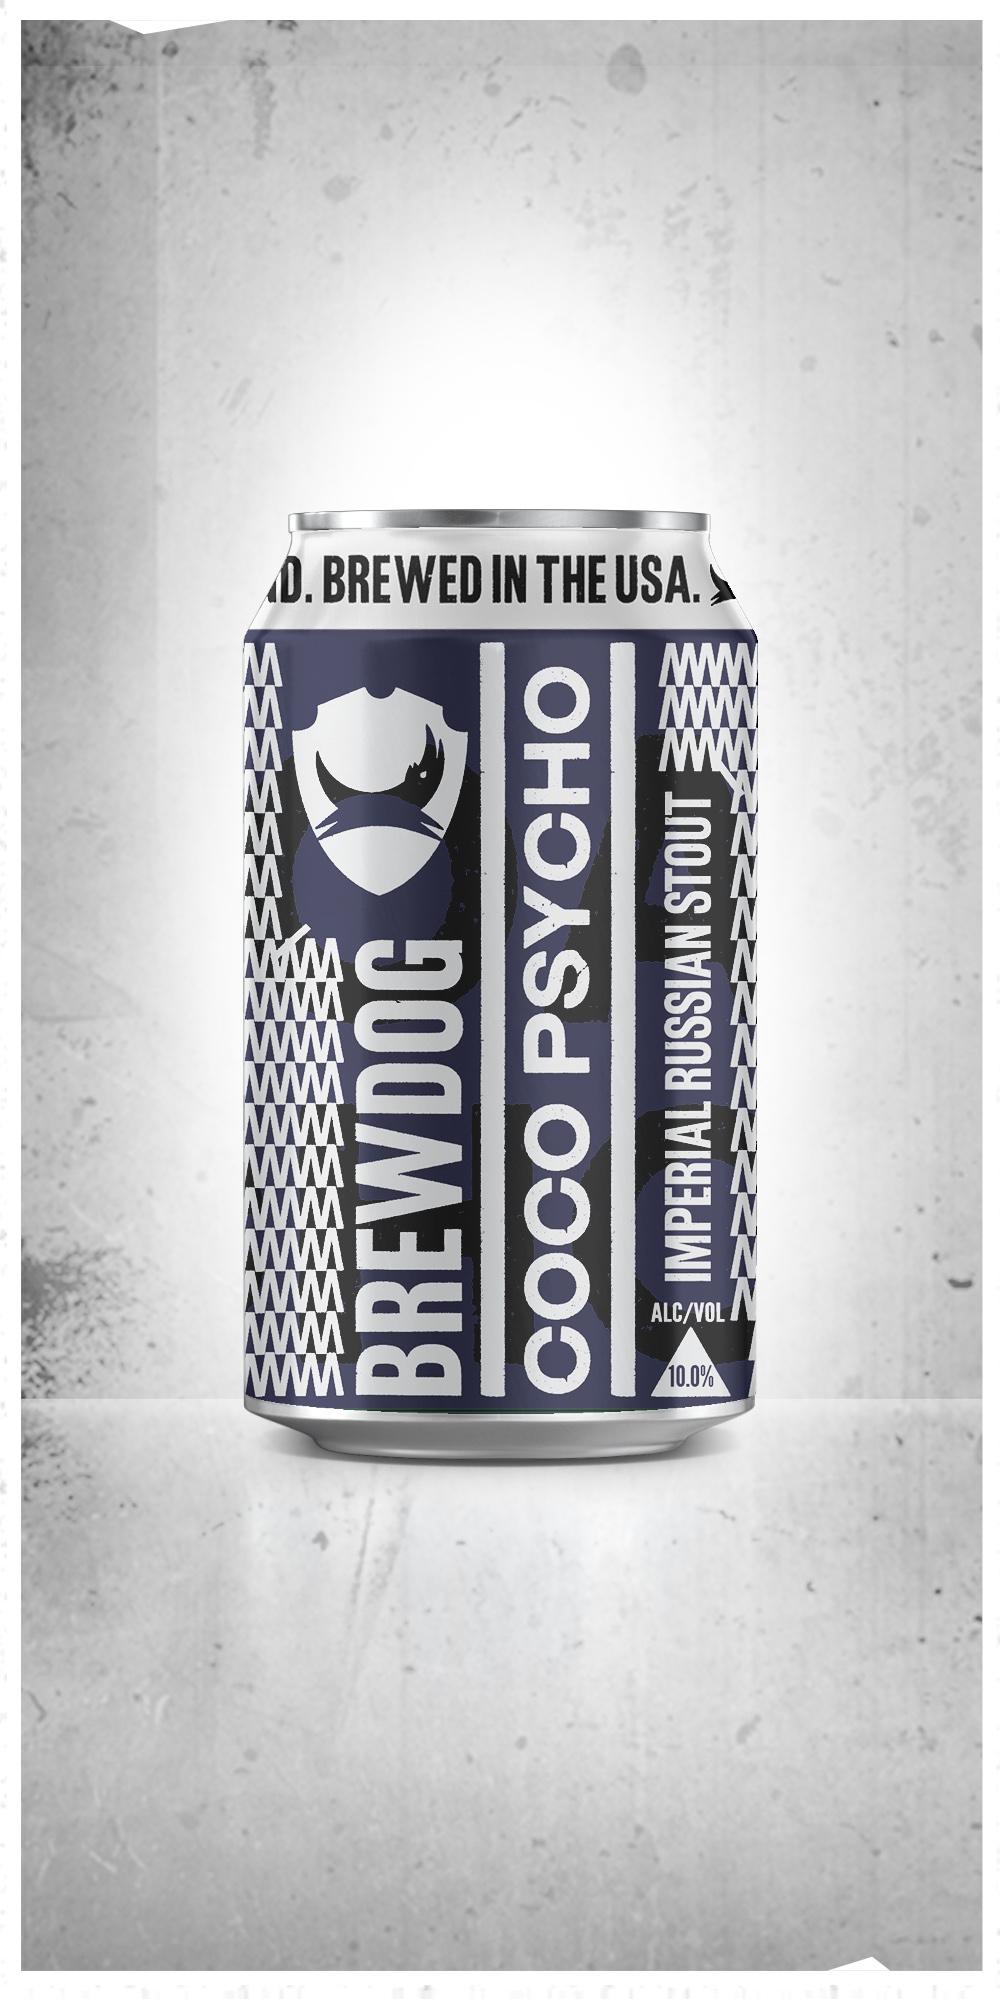 BrewDog Can Image Cocoa Psycho.jpg